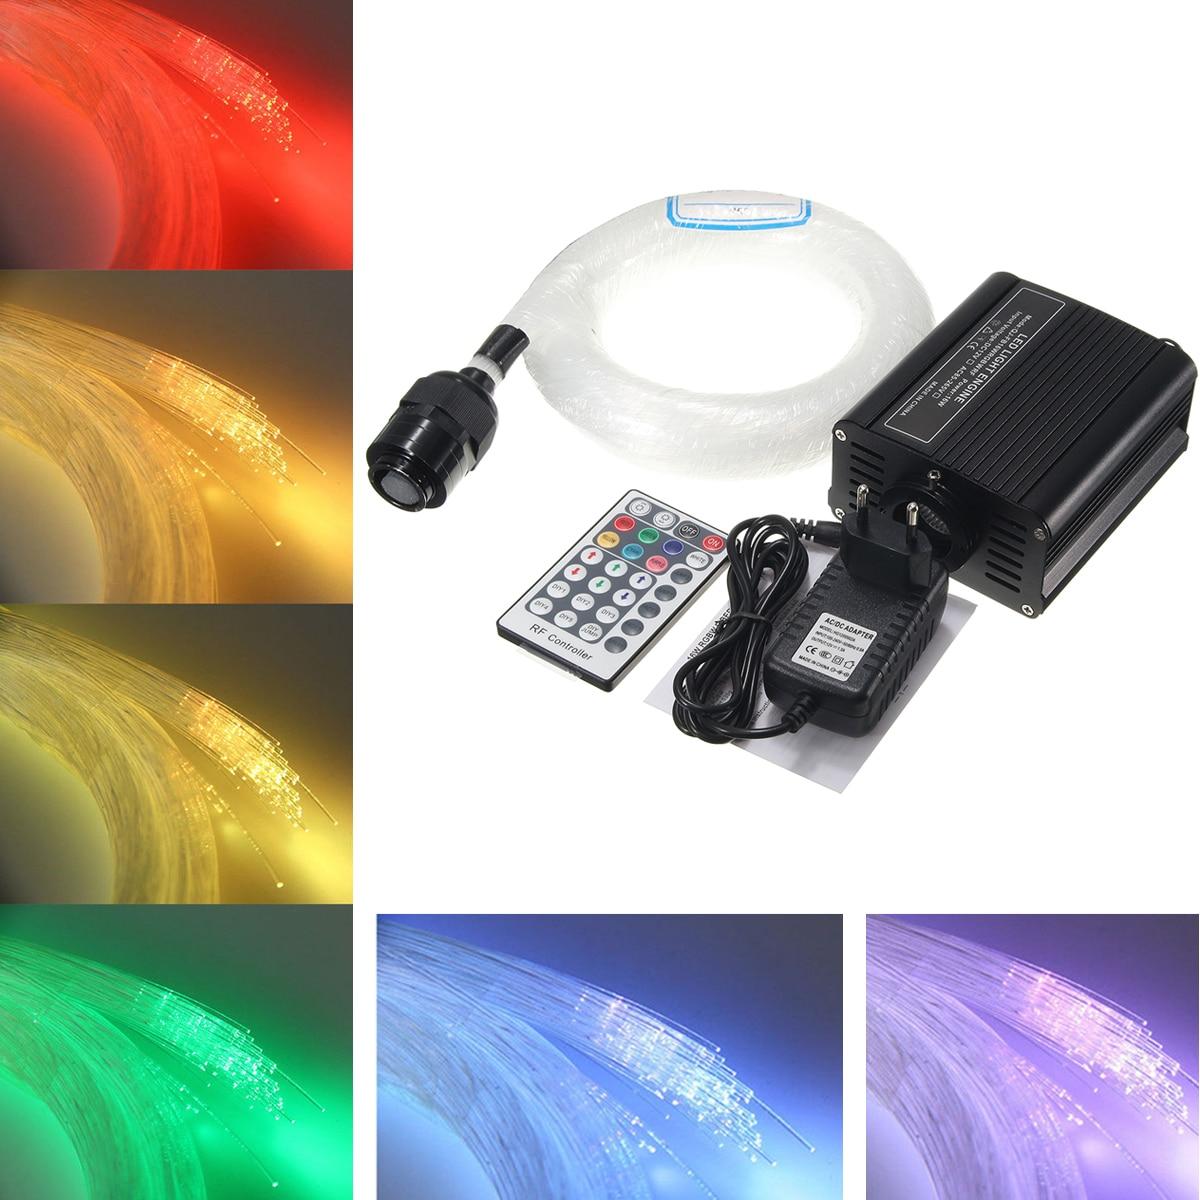 200Pcs 0.75mm X 2m Colorful Fiber Optic Lights  RGB Twinkle LED Star Ceiling Light Kit For Fiber Optic Light  Engine Machine